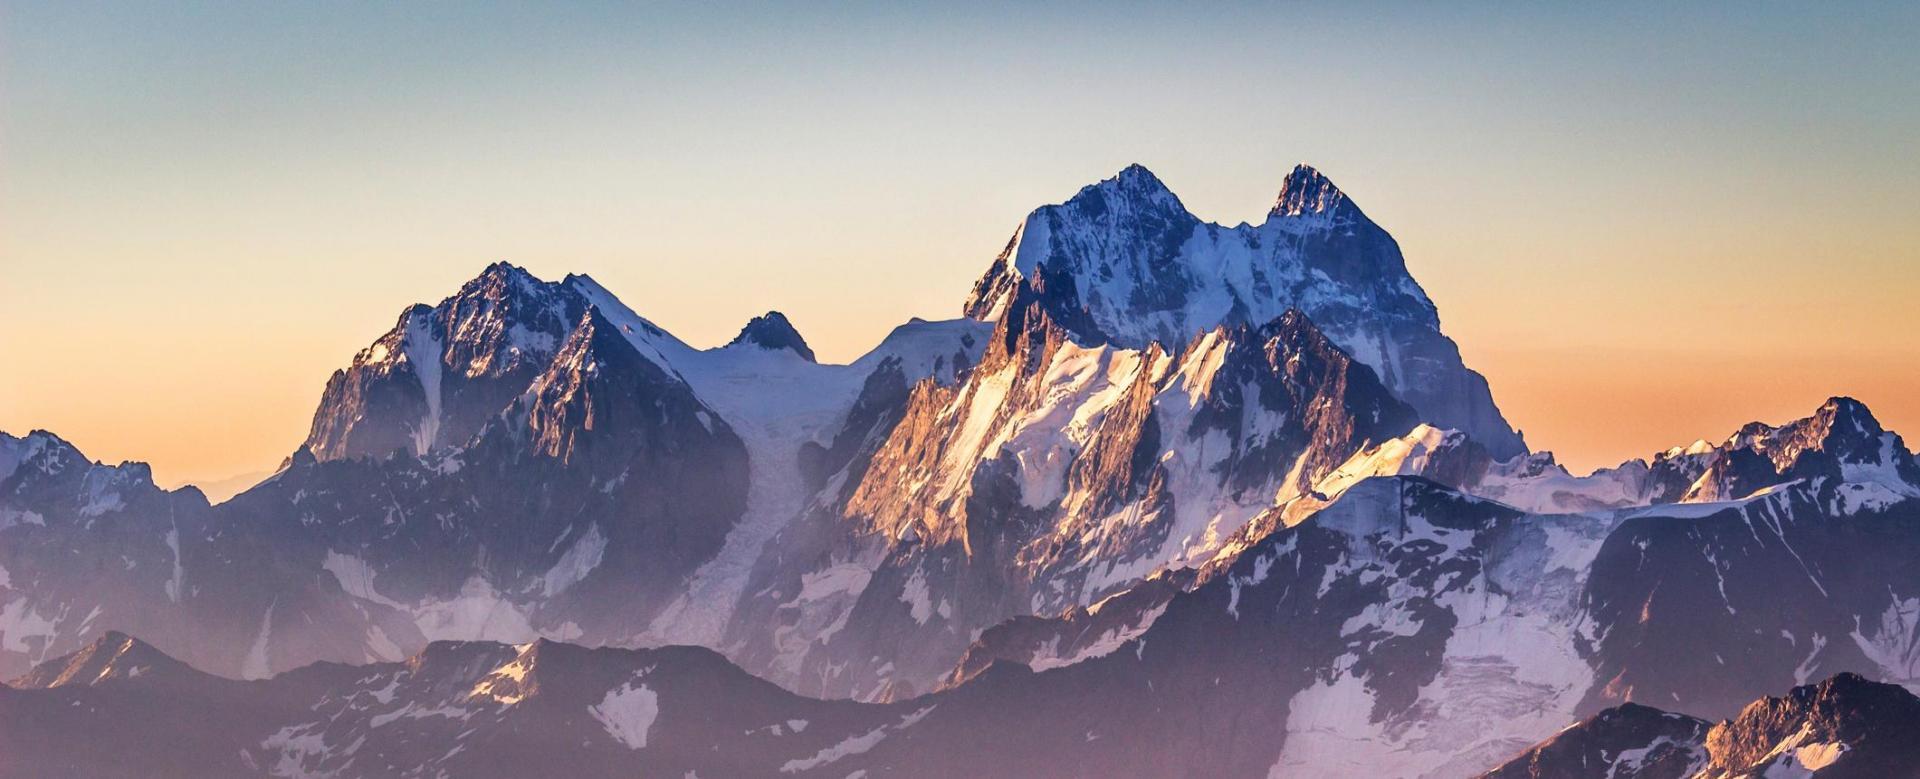 Trekking Georgie : Géants de glace de svanétie